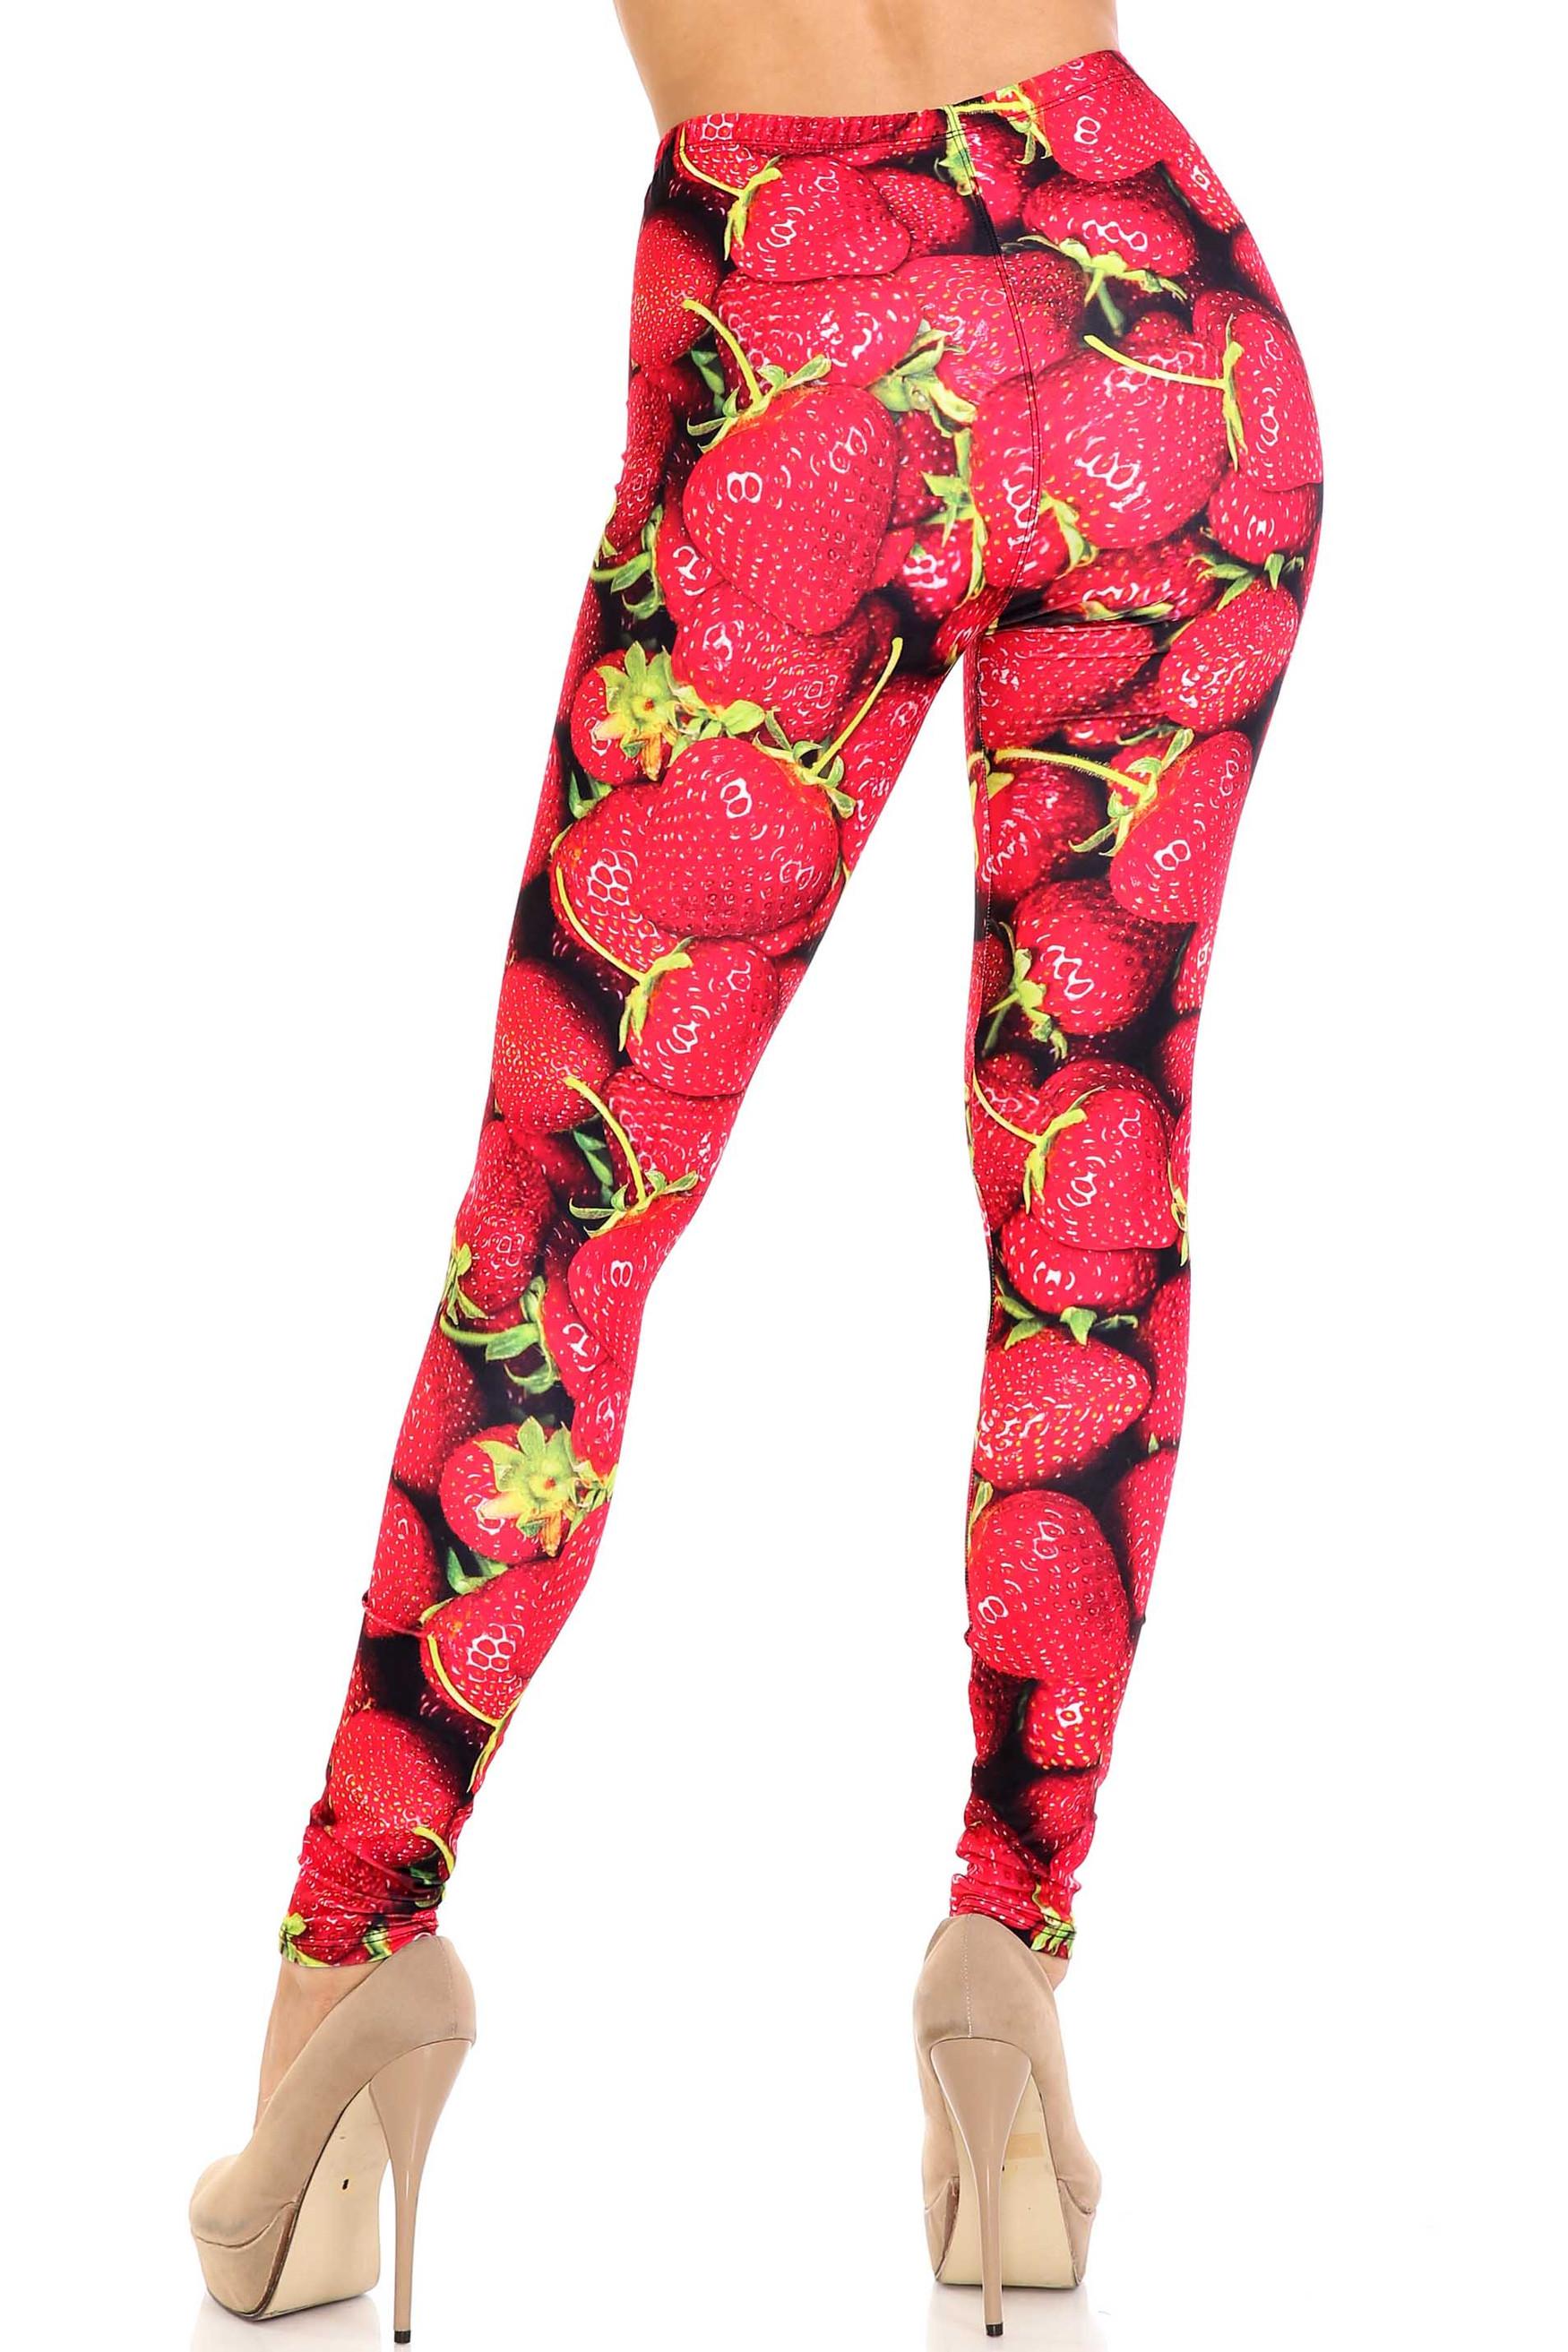 Creamy Soft Strawberry Plus Size Leggings - USA Fashion™